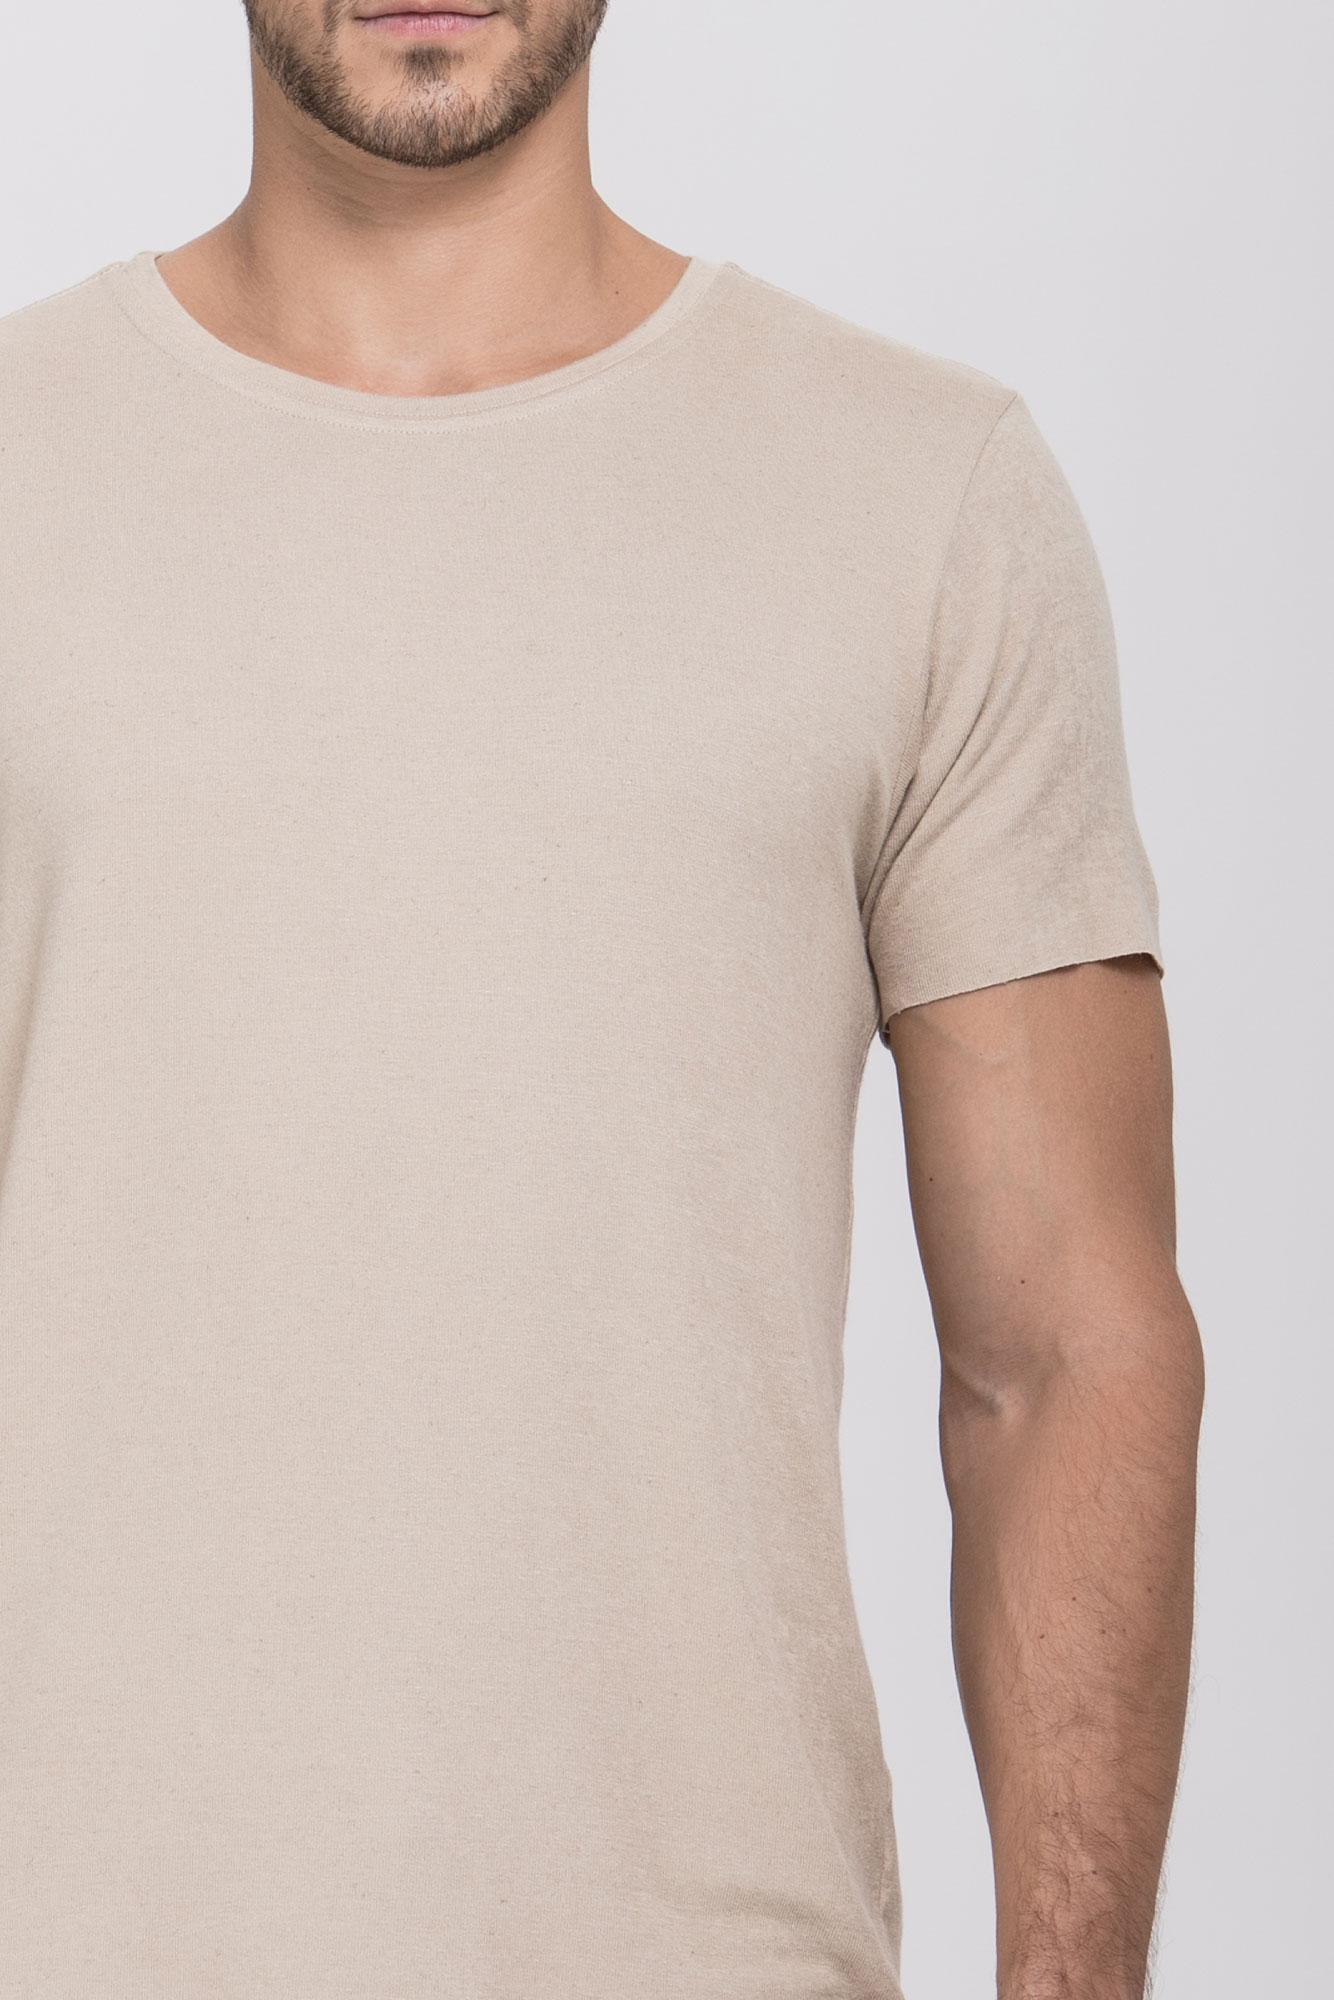 Camiseta Live Better Natural